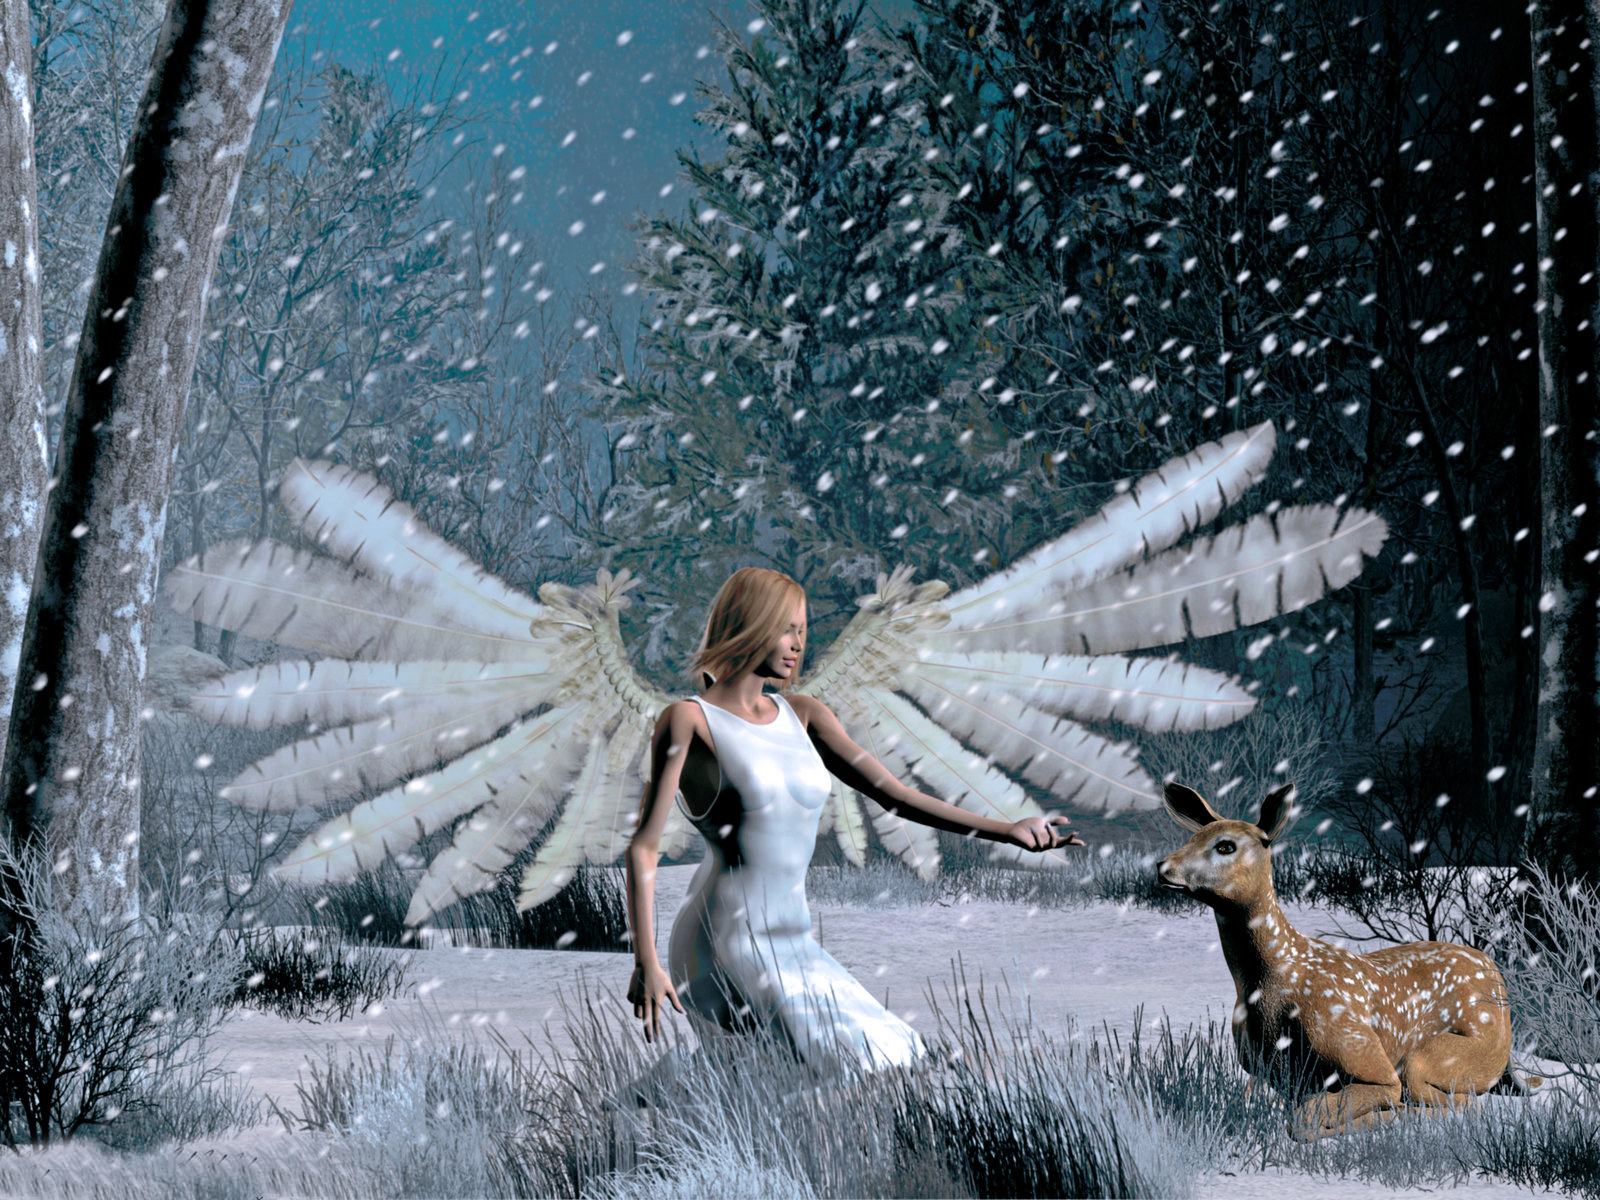 christmas desktop wallpaper Christmas Angel Wallpapers 1600x1200